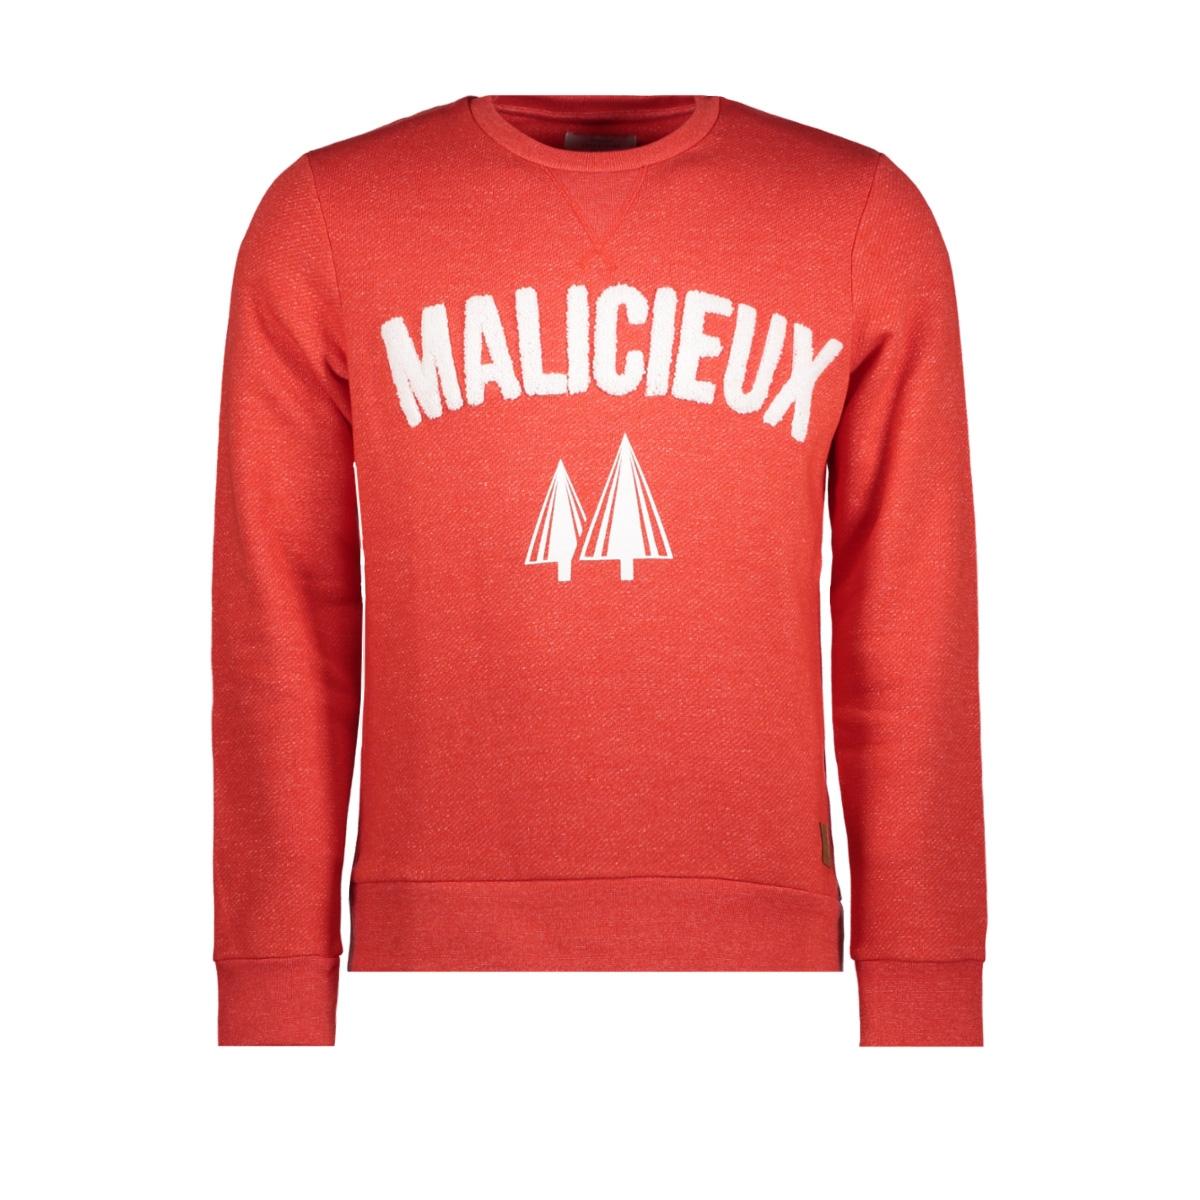 jorelton sweat crew neck 12144353 jack & jones sweater fiery red/slim